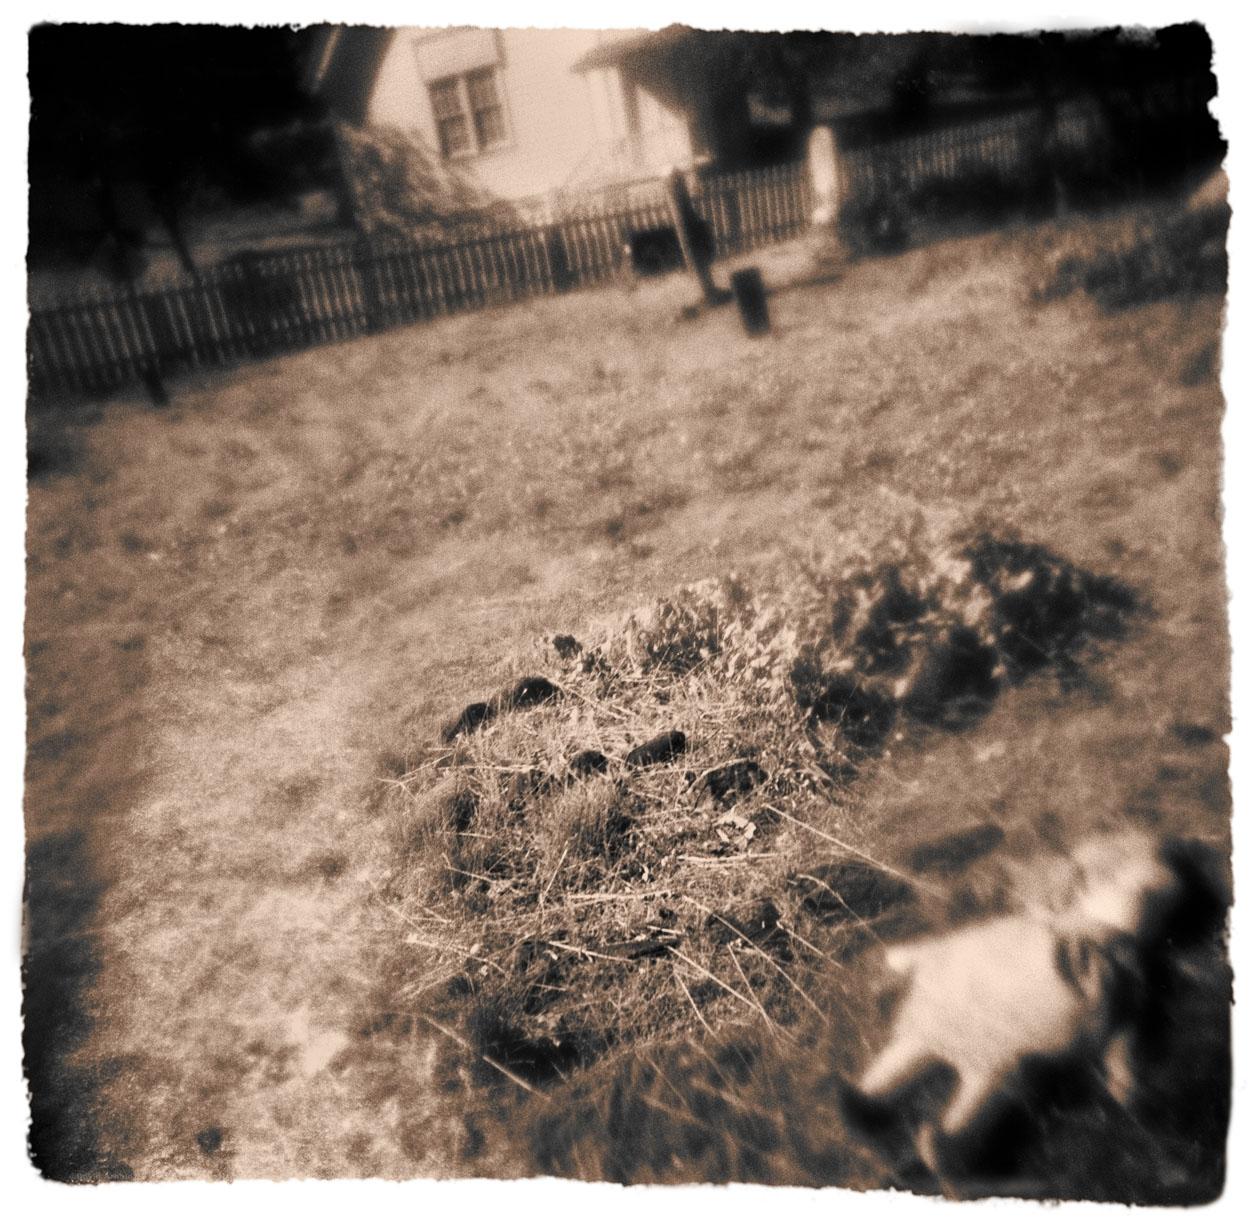 Doll, Cemetery, Lewiston, Trinity County, California